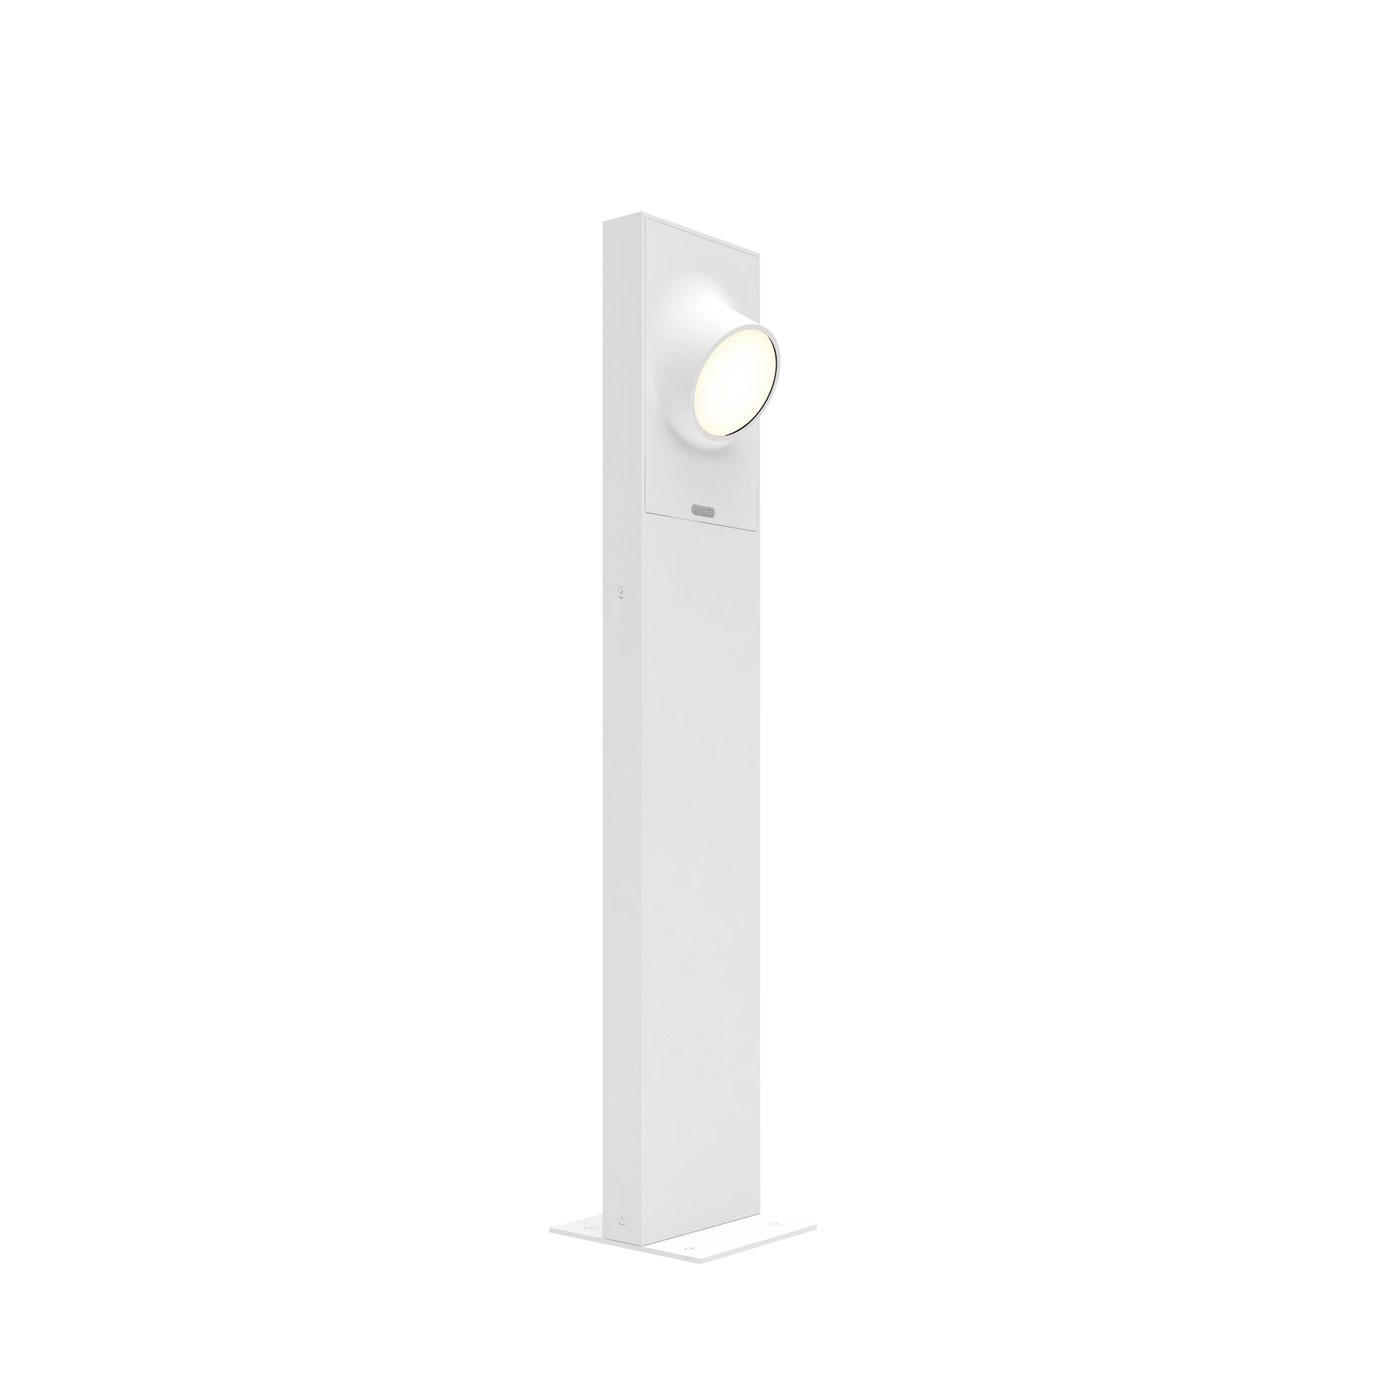 Artemide Architectural Ciclope LED Terra 90 Monolaterale